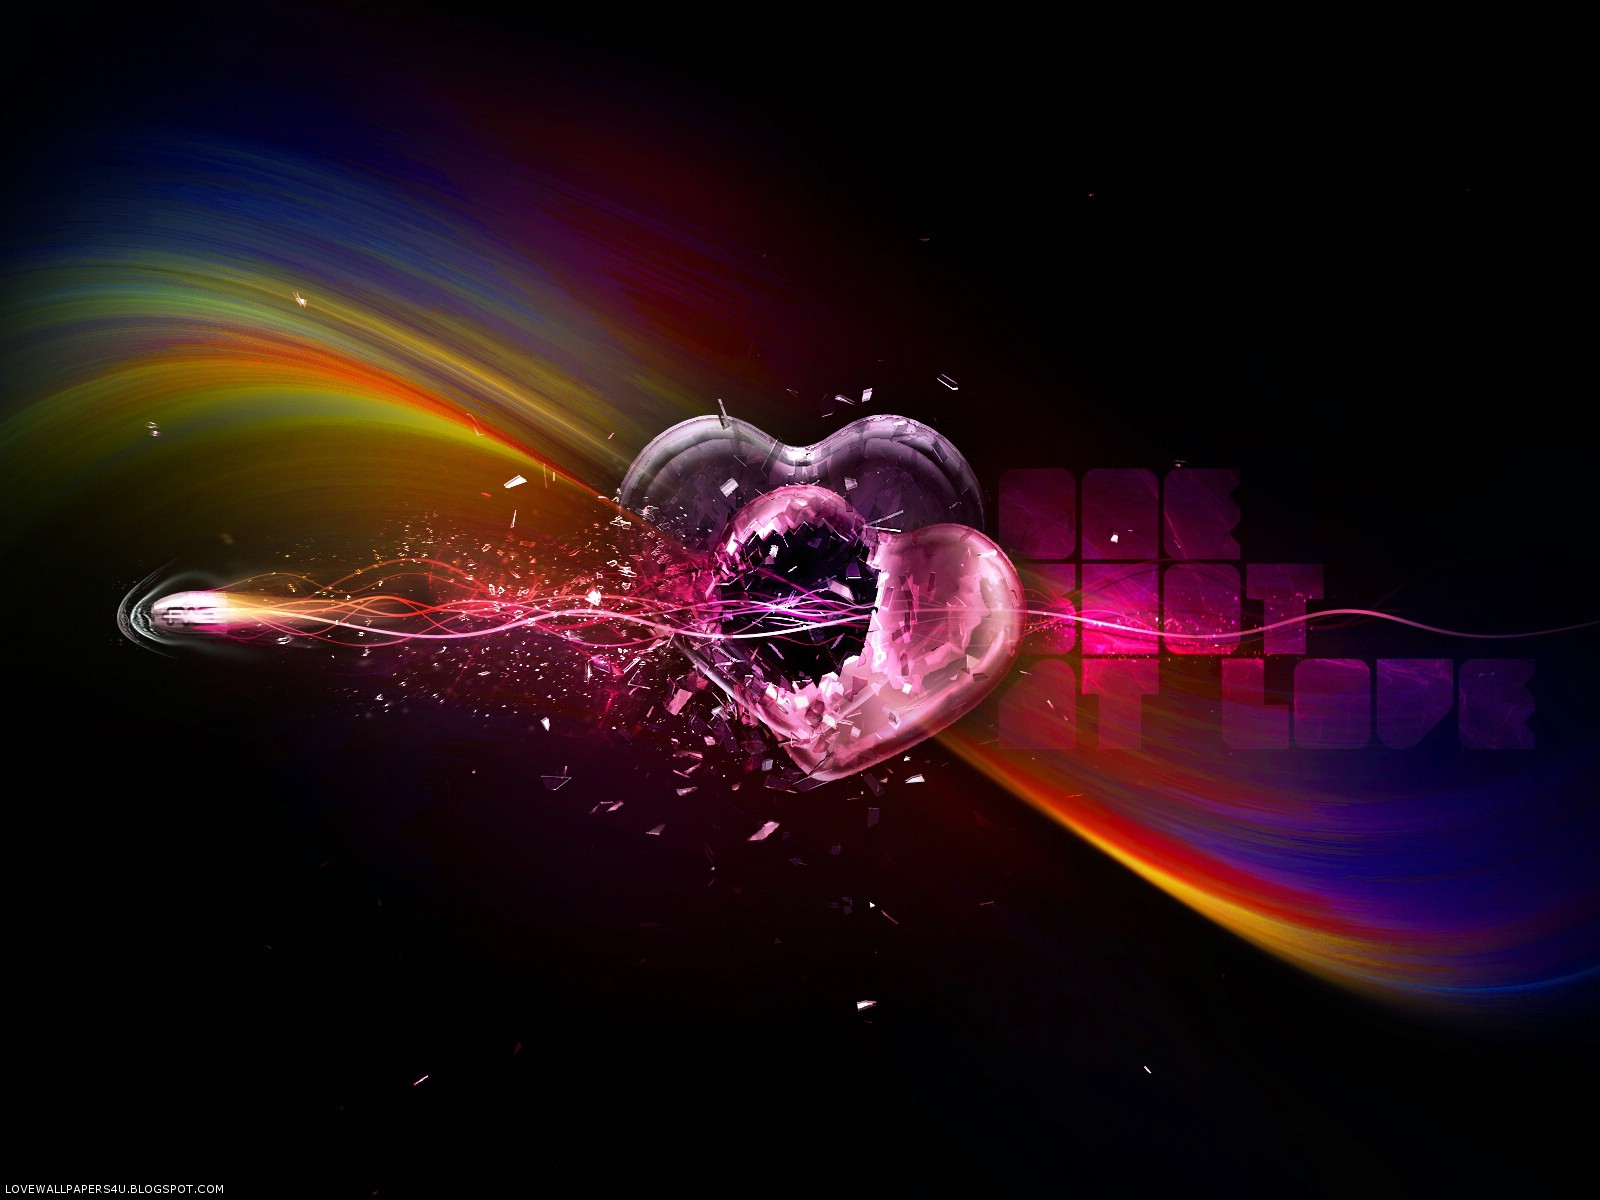 Romantic Wallpapers HD Wallpapers Heart Wallpaper Love Wallpapers 4U 1600x1200